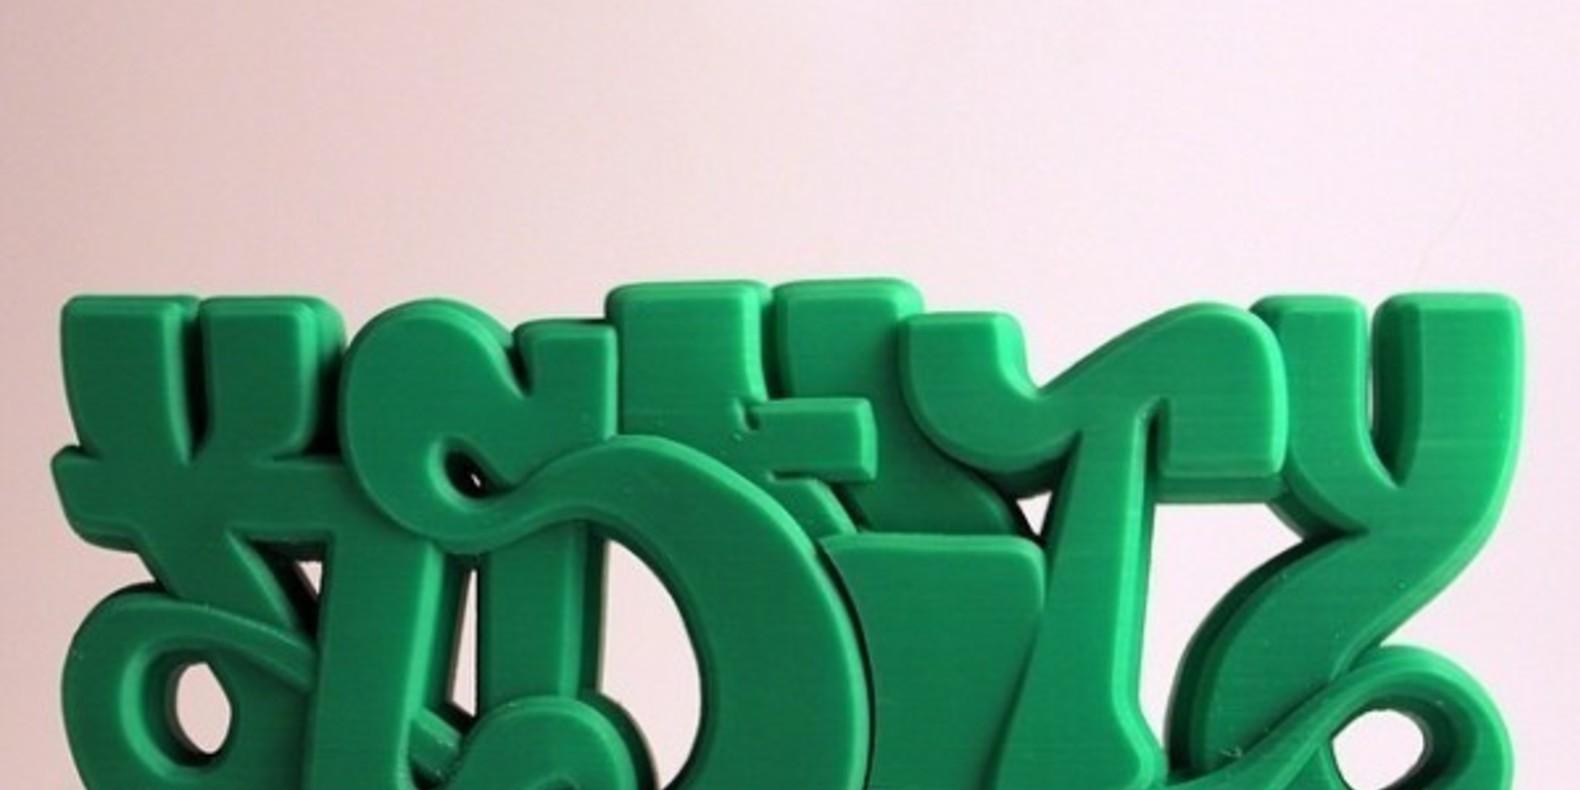 11-KUSHTY-3DPrint graffitis imprimés en 3D Noramlly Ben